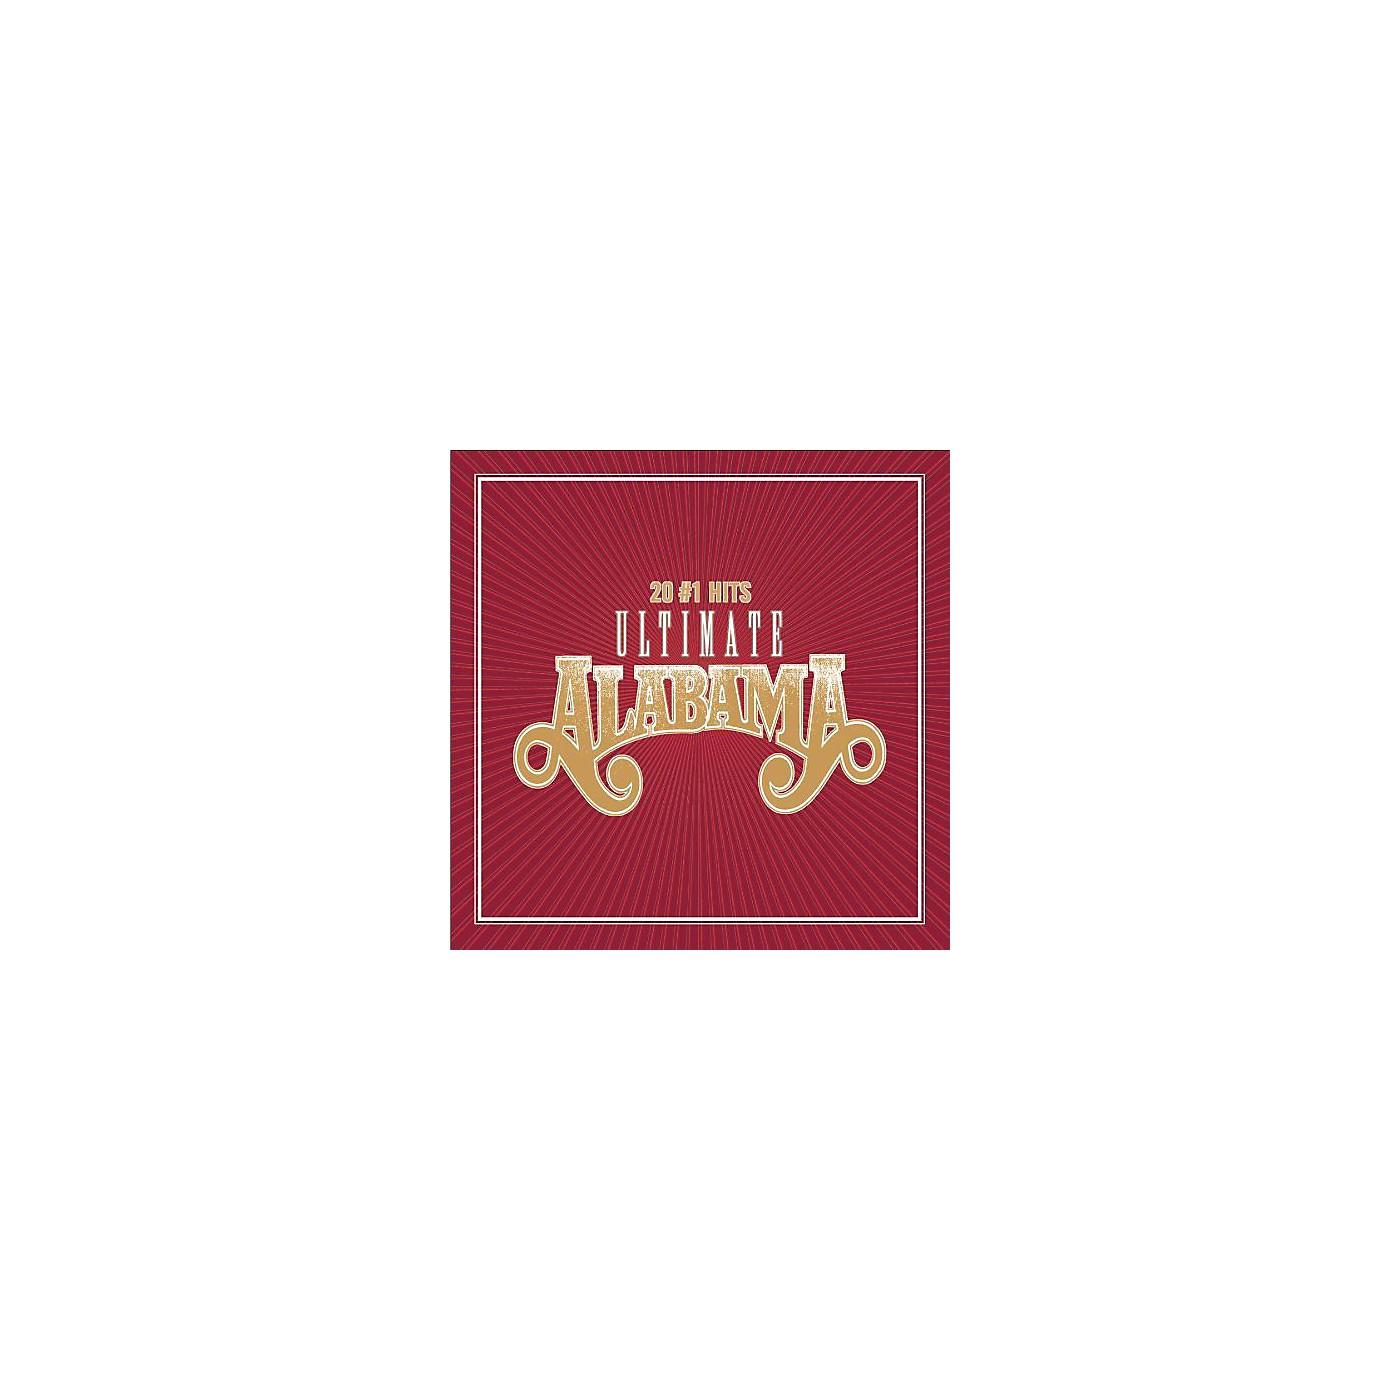 Alliance Alabama - Ultimate 20 #1 Hits (CD) thumbnail